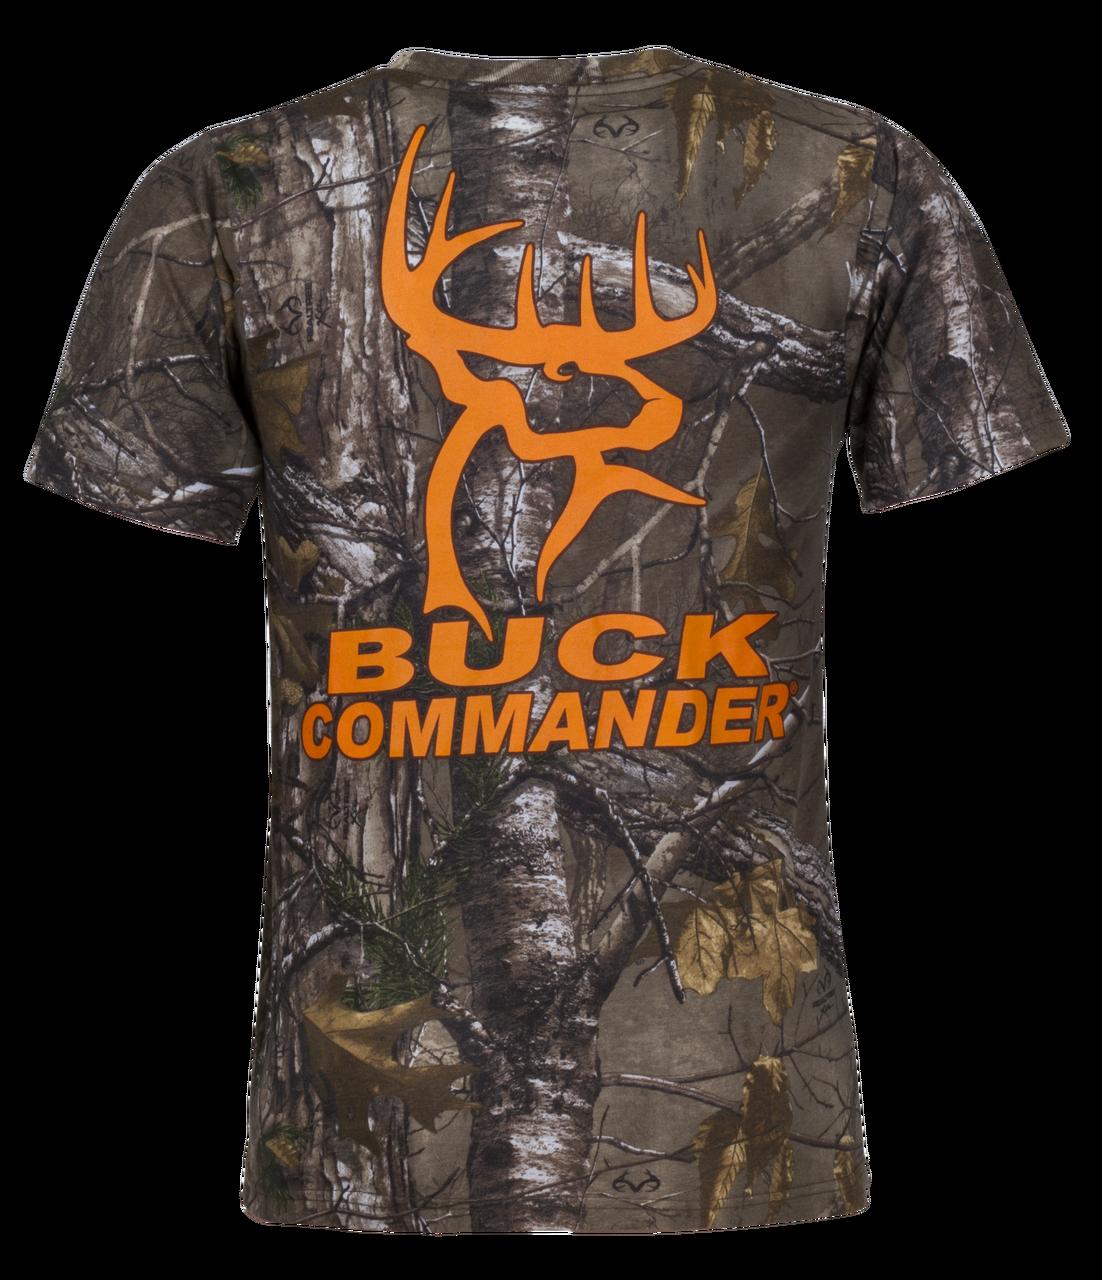 Camo buck commander logo